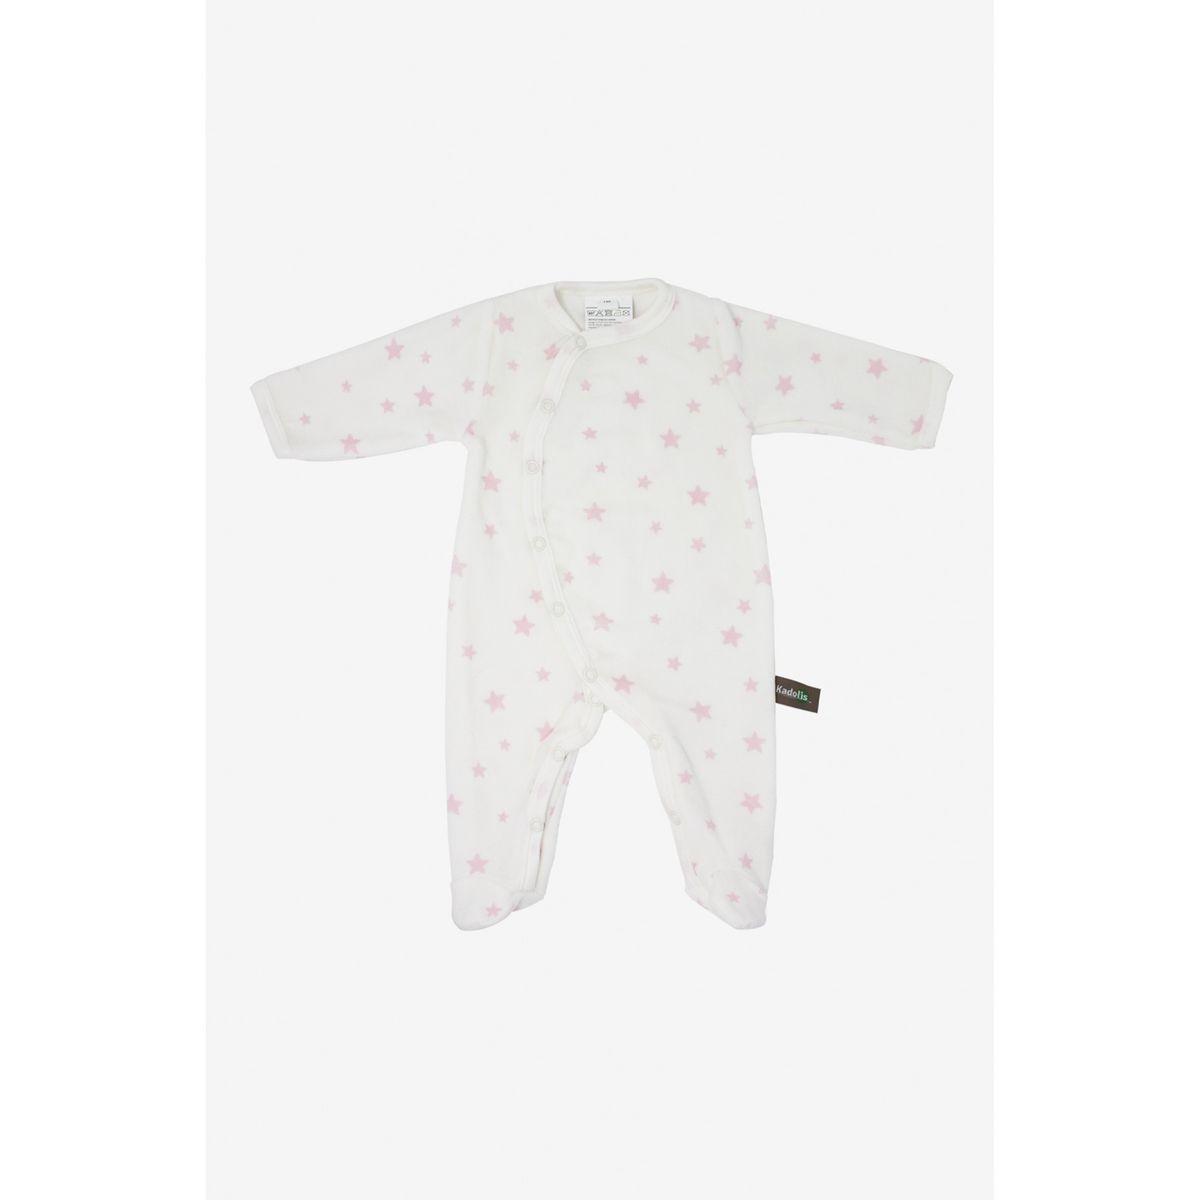 Pyjama bébé en coton bio imprimé étoiles